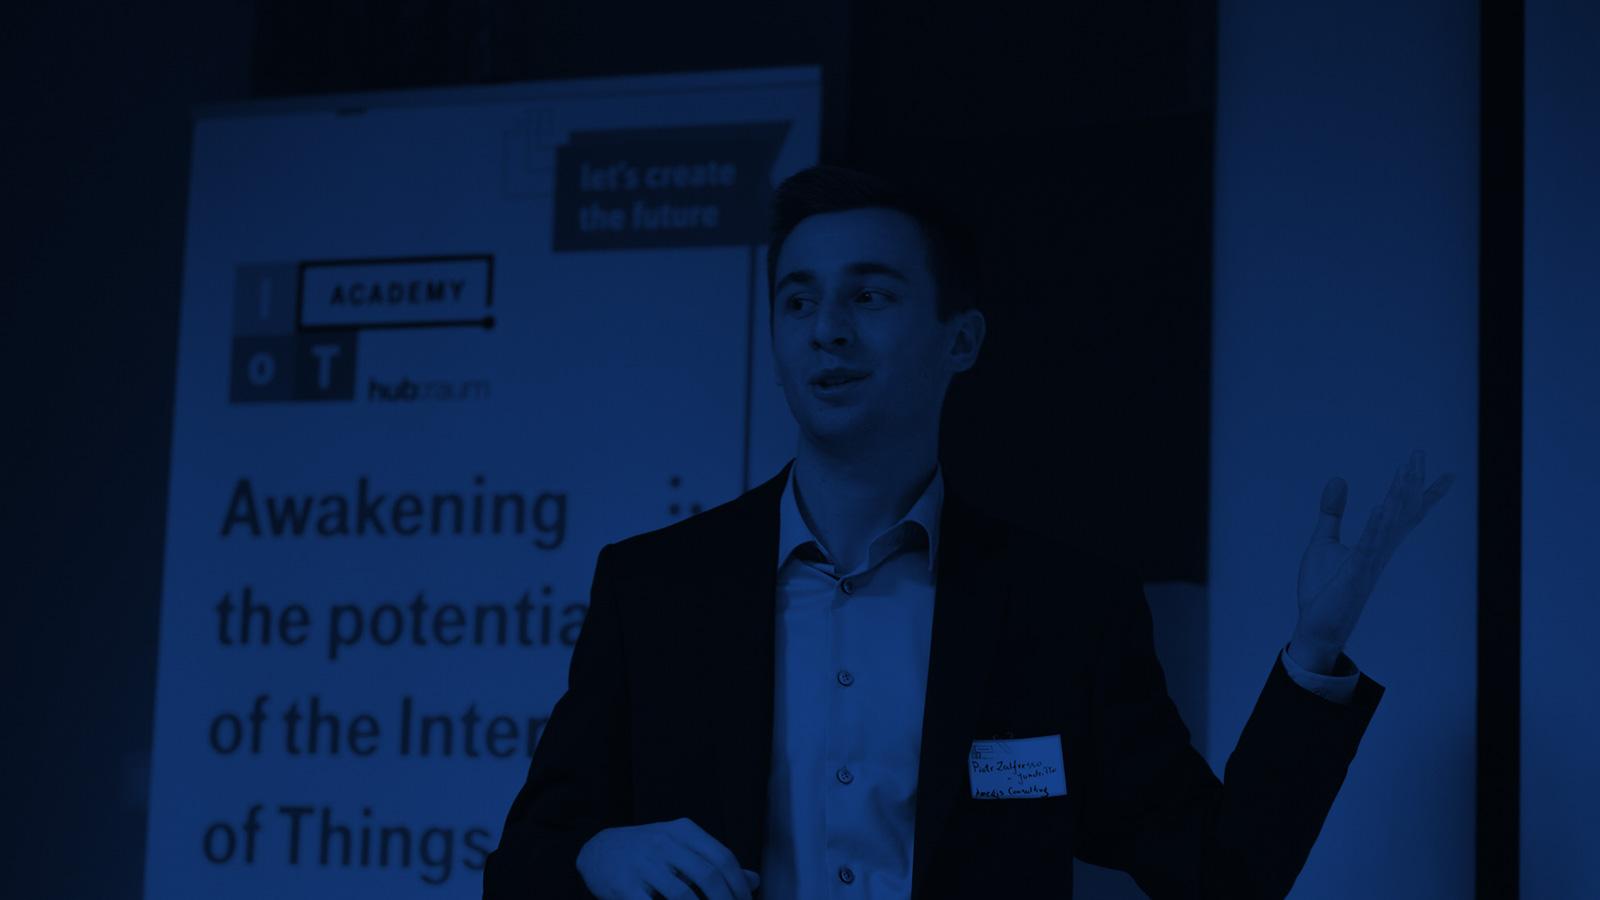 ANEGIS present IoT sensors at Deutsche Telekom hub:raum IoT Academy